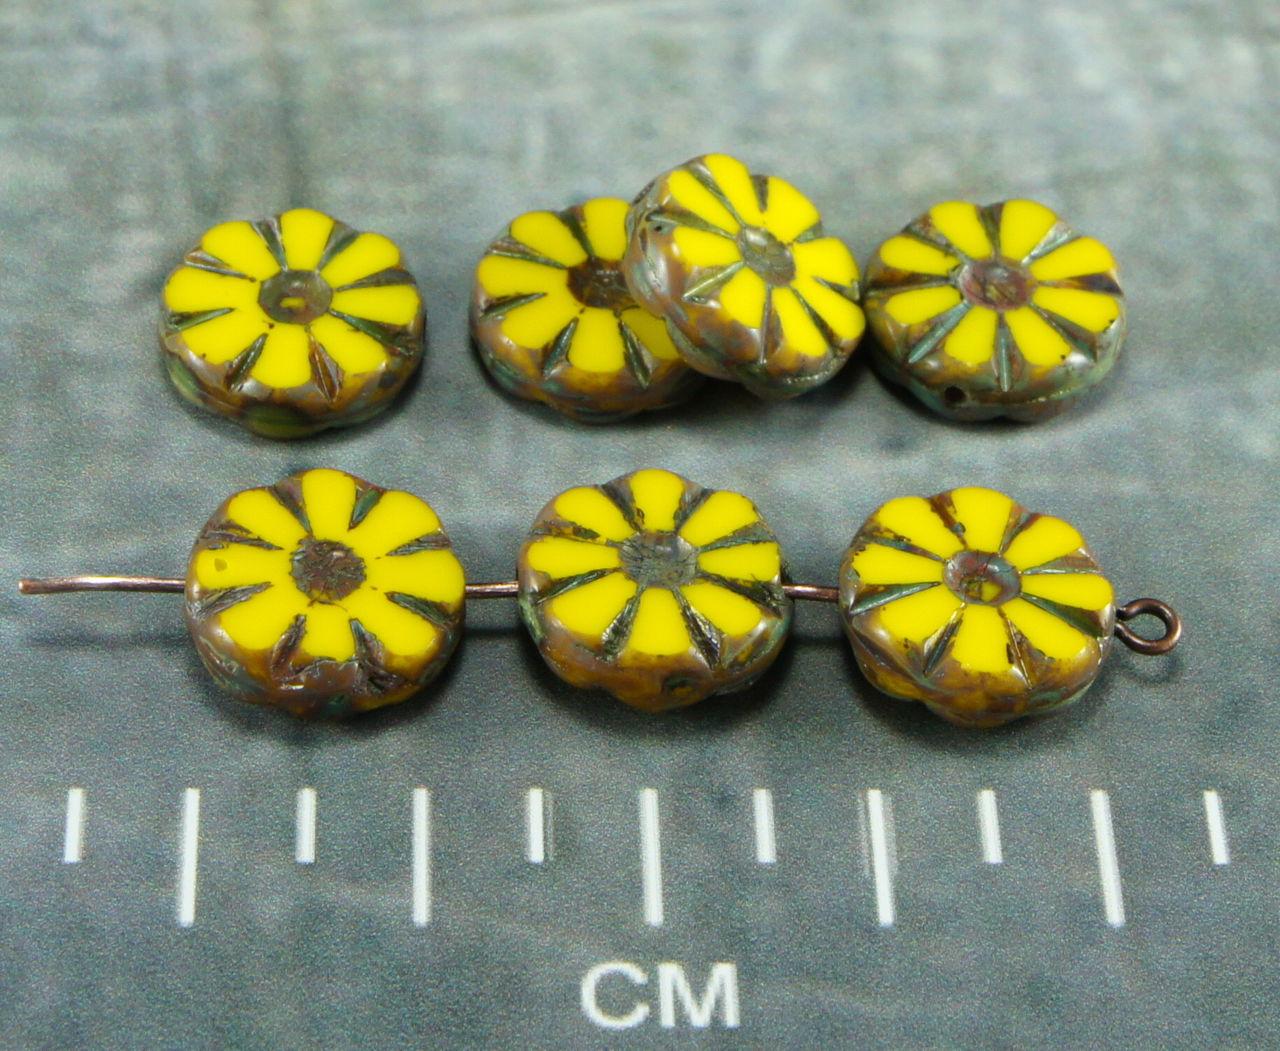 8pcs Picasso Travertine Table Cut Flower Flat Coin Czech Glass Beads 12mm